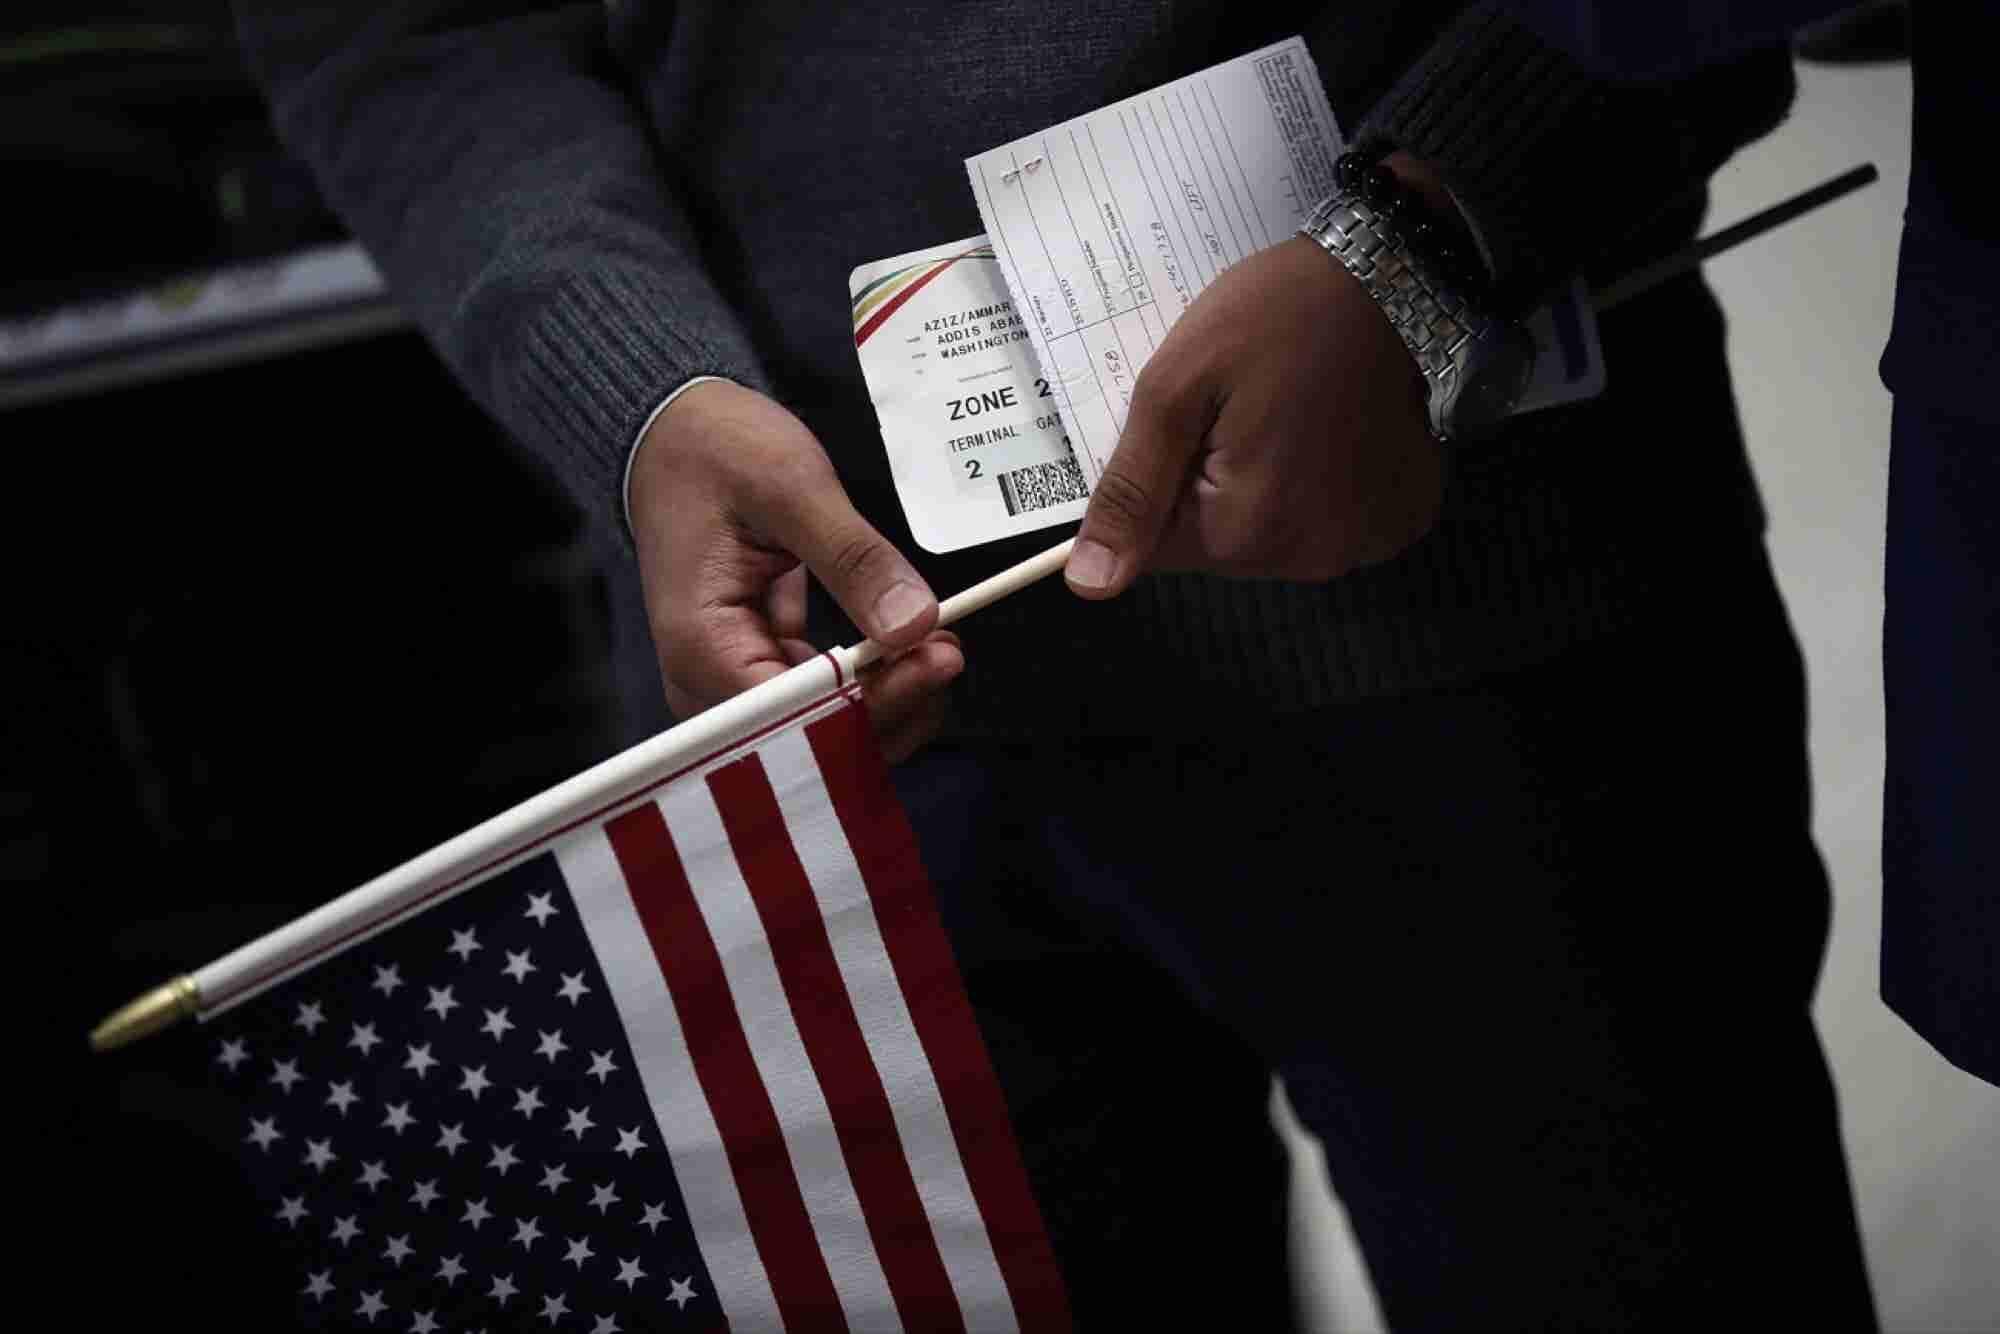 Trump's Travel Ban: What Has Happened So Far